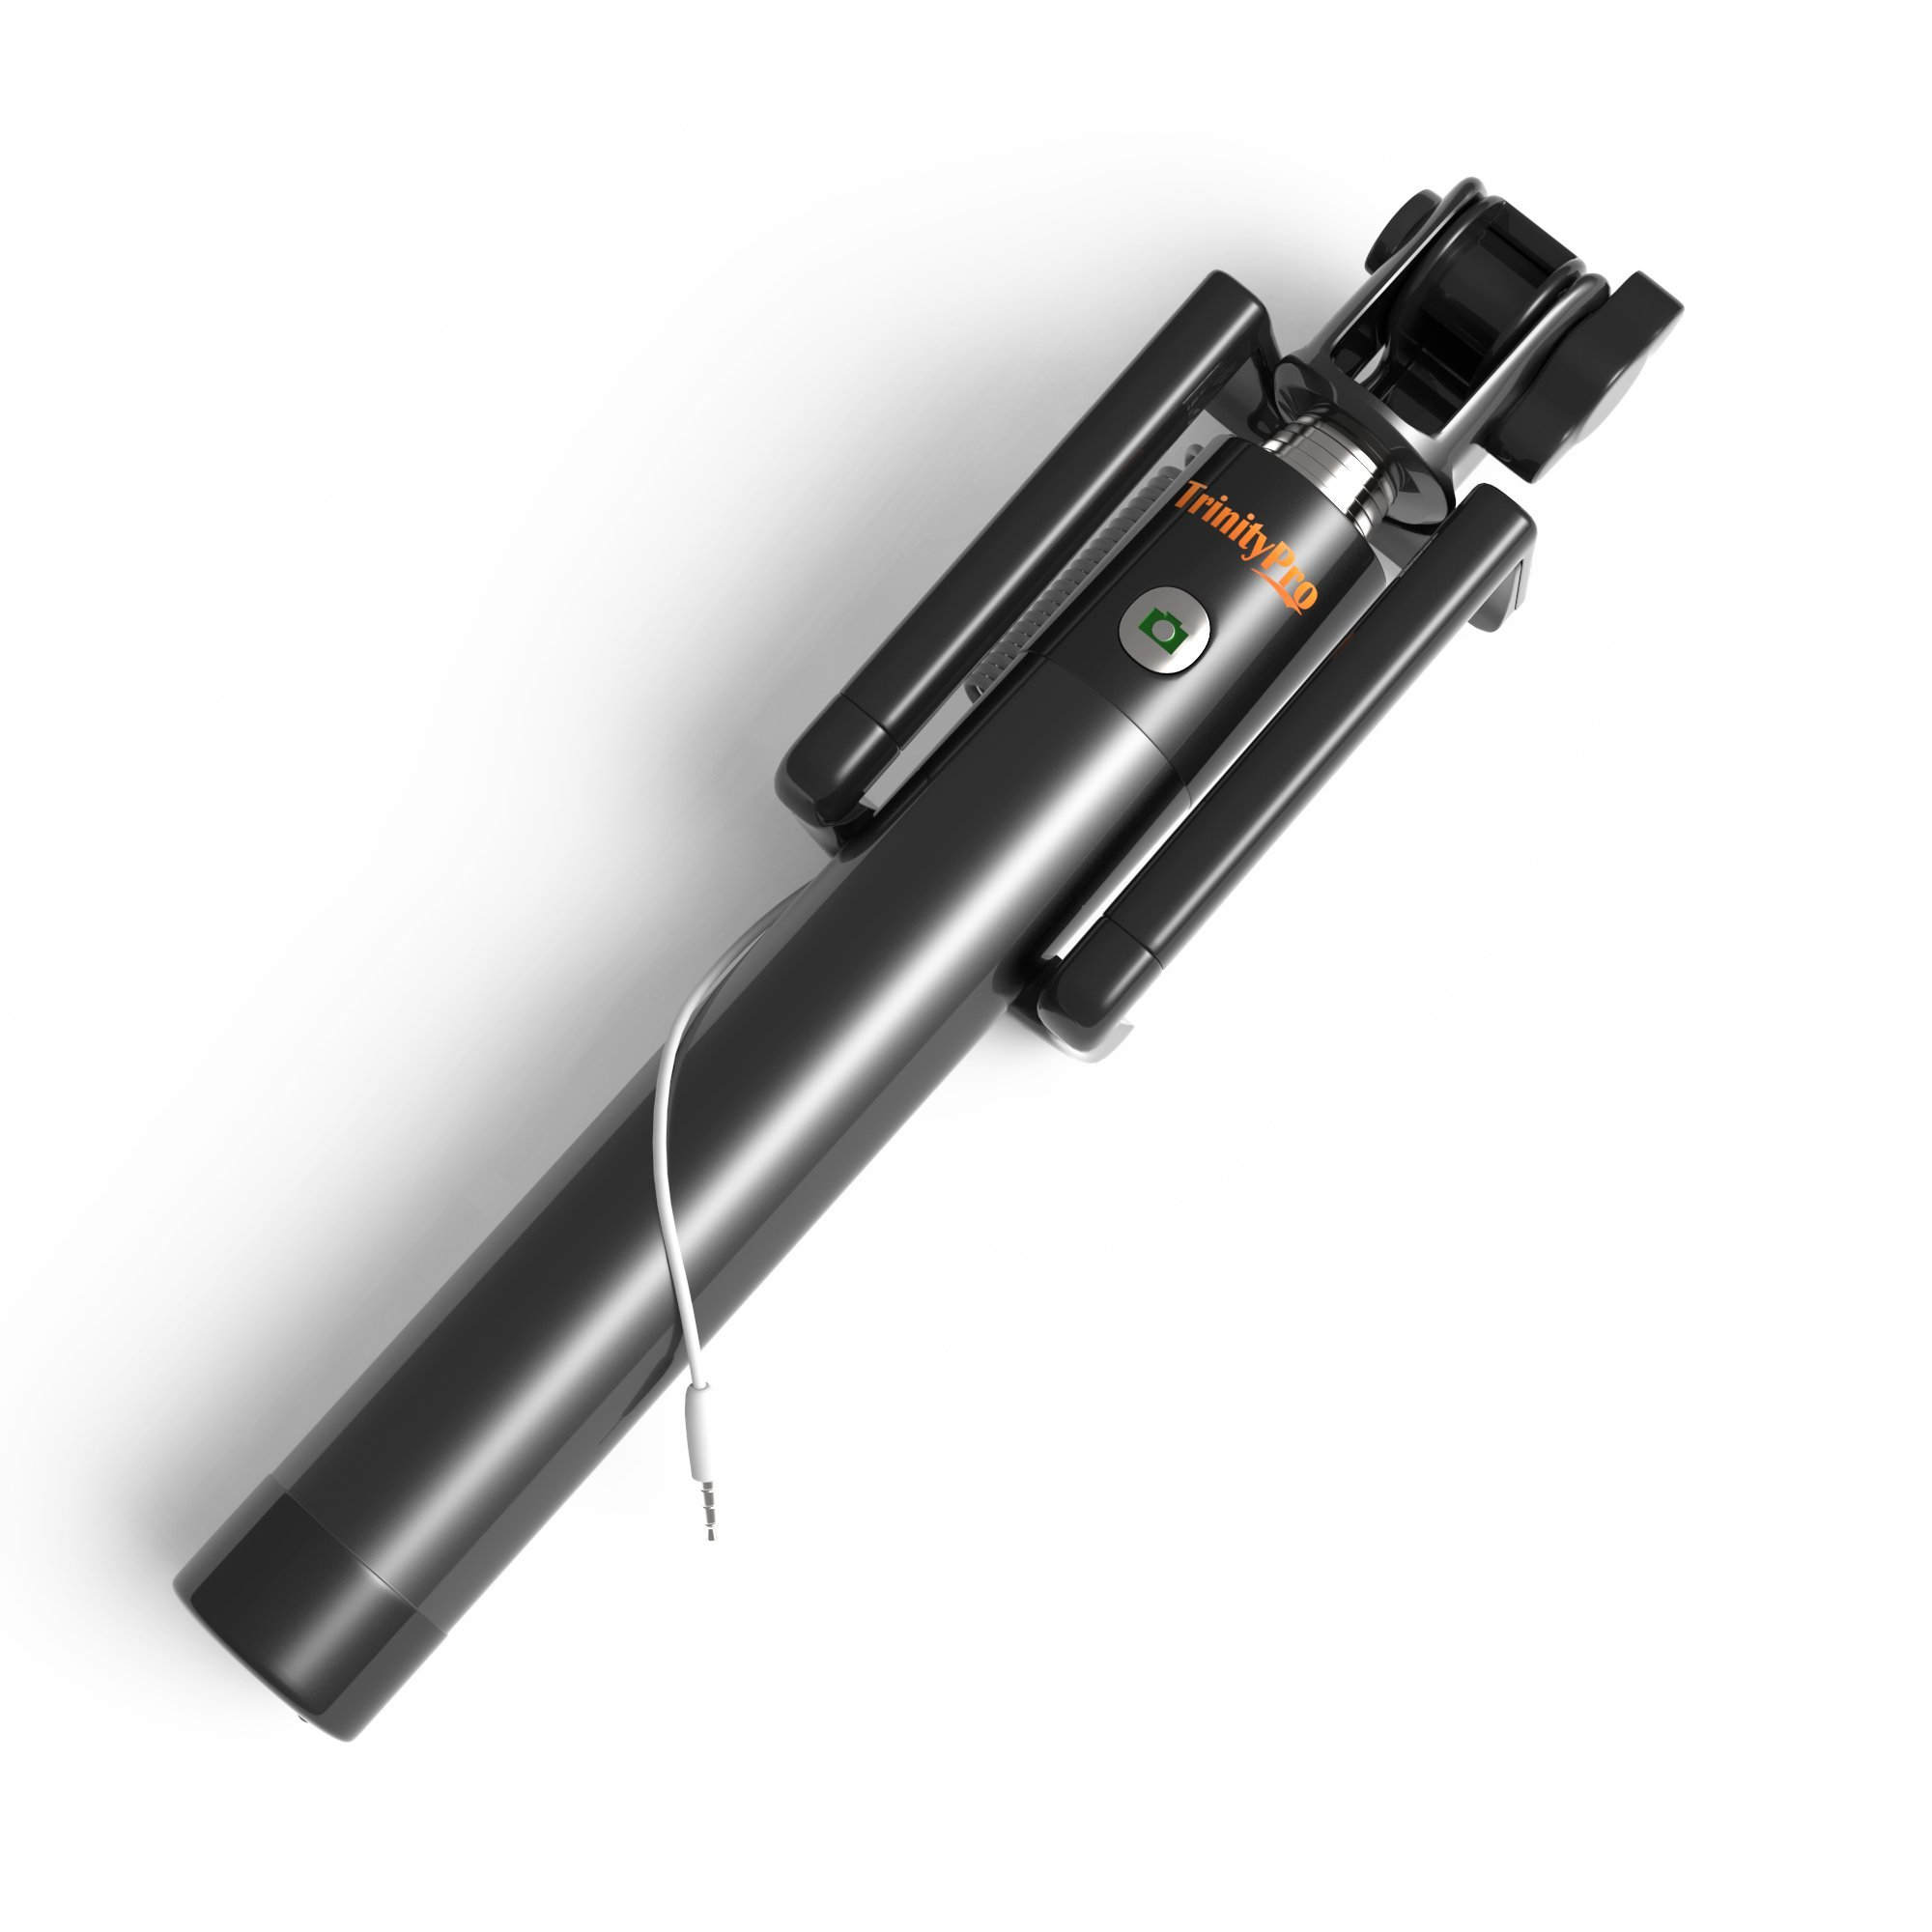 THE Best Selfie Sticks- LIFETIME Direct Connect =No Bluetooth! Adjustable For All Phones- iPhone 6/5 Samsung Galaxy S5 & More- Portable Plus Retractible- iExplore GoPro Lightweight Hi-Grade Aluminum